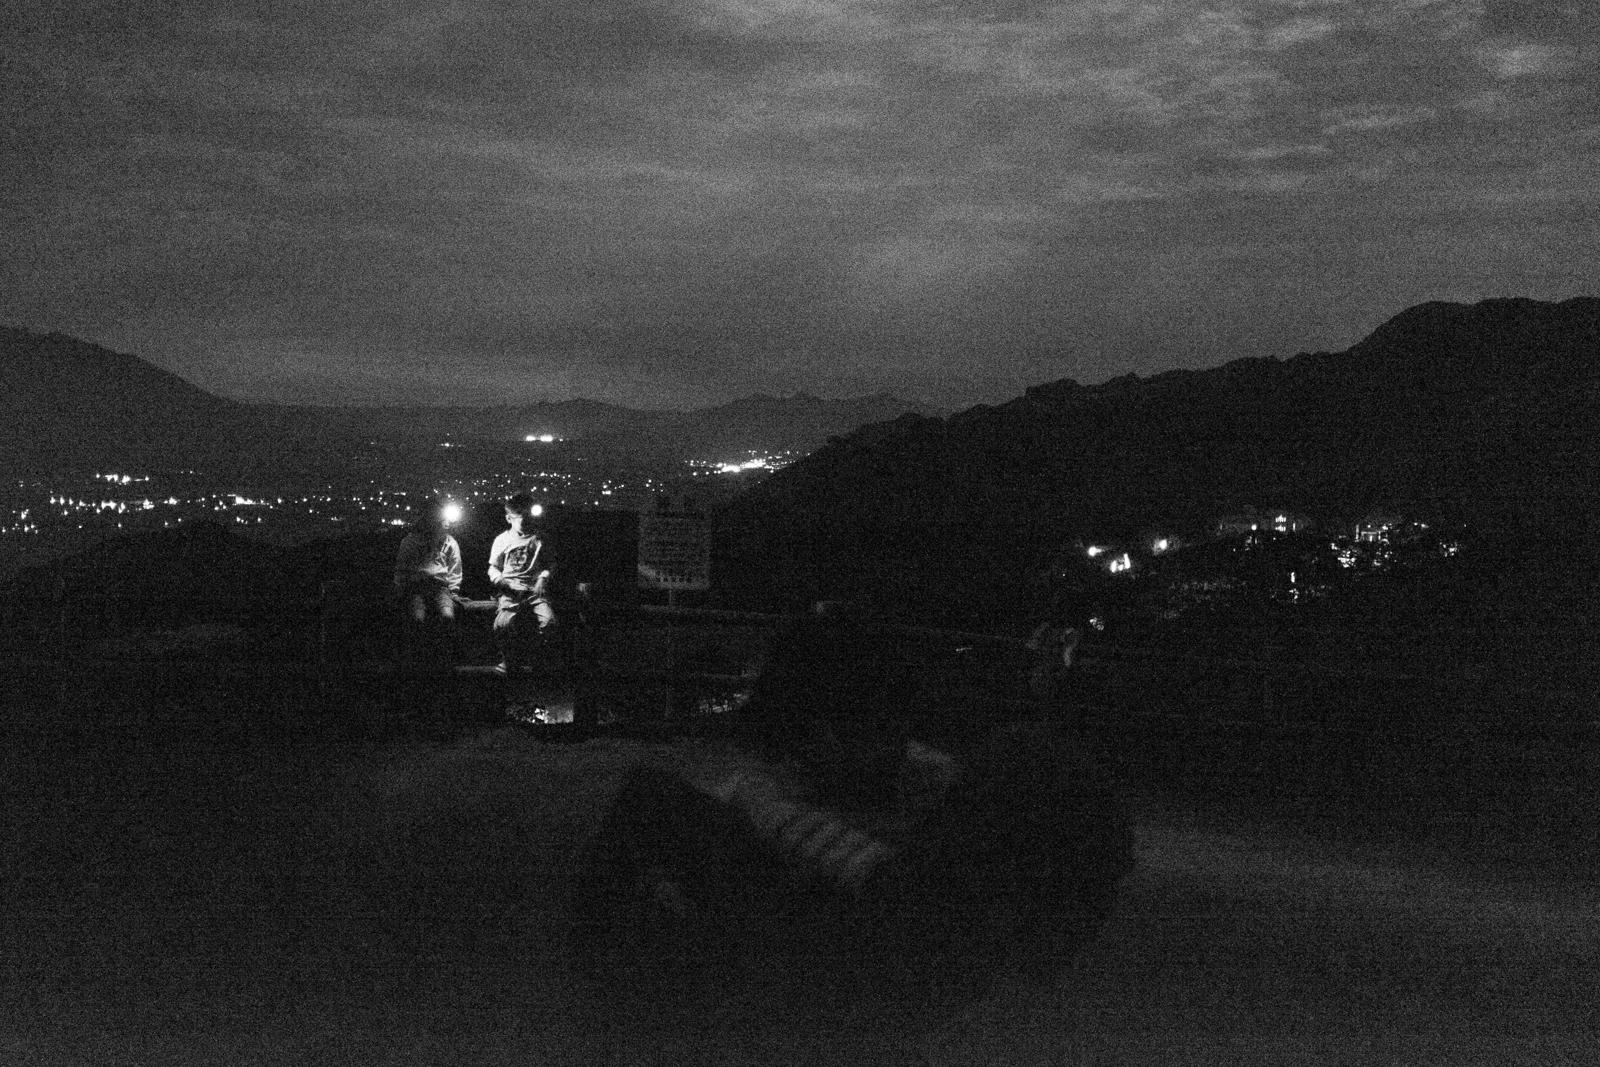 Piggy back ride in the dark (Kyushu, Japan - 2015)